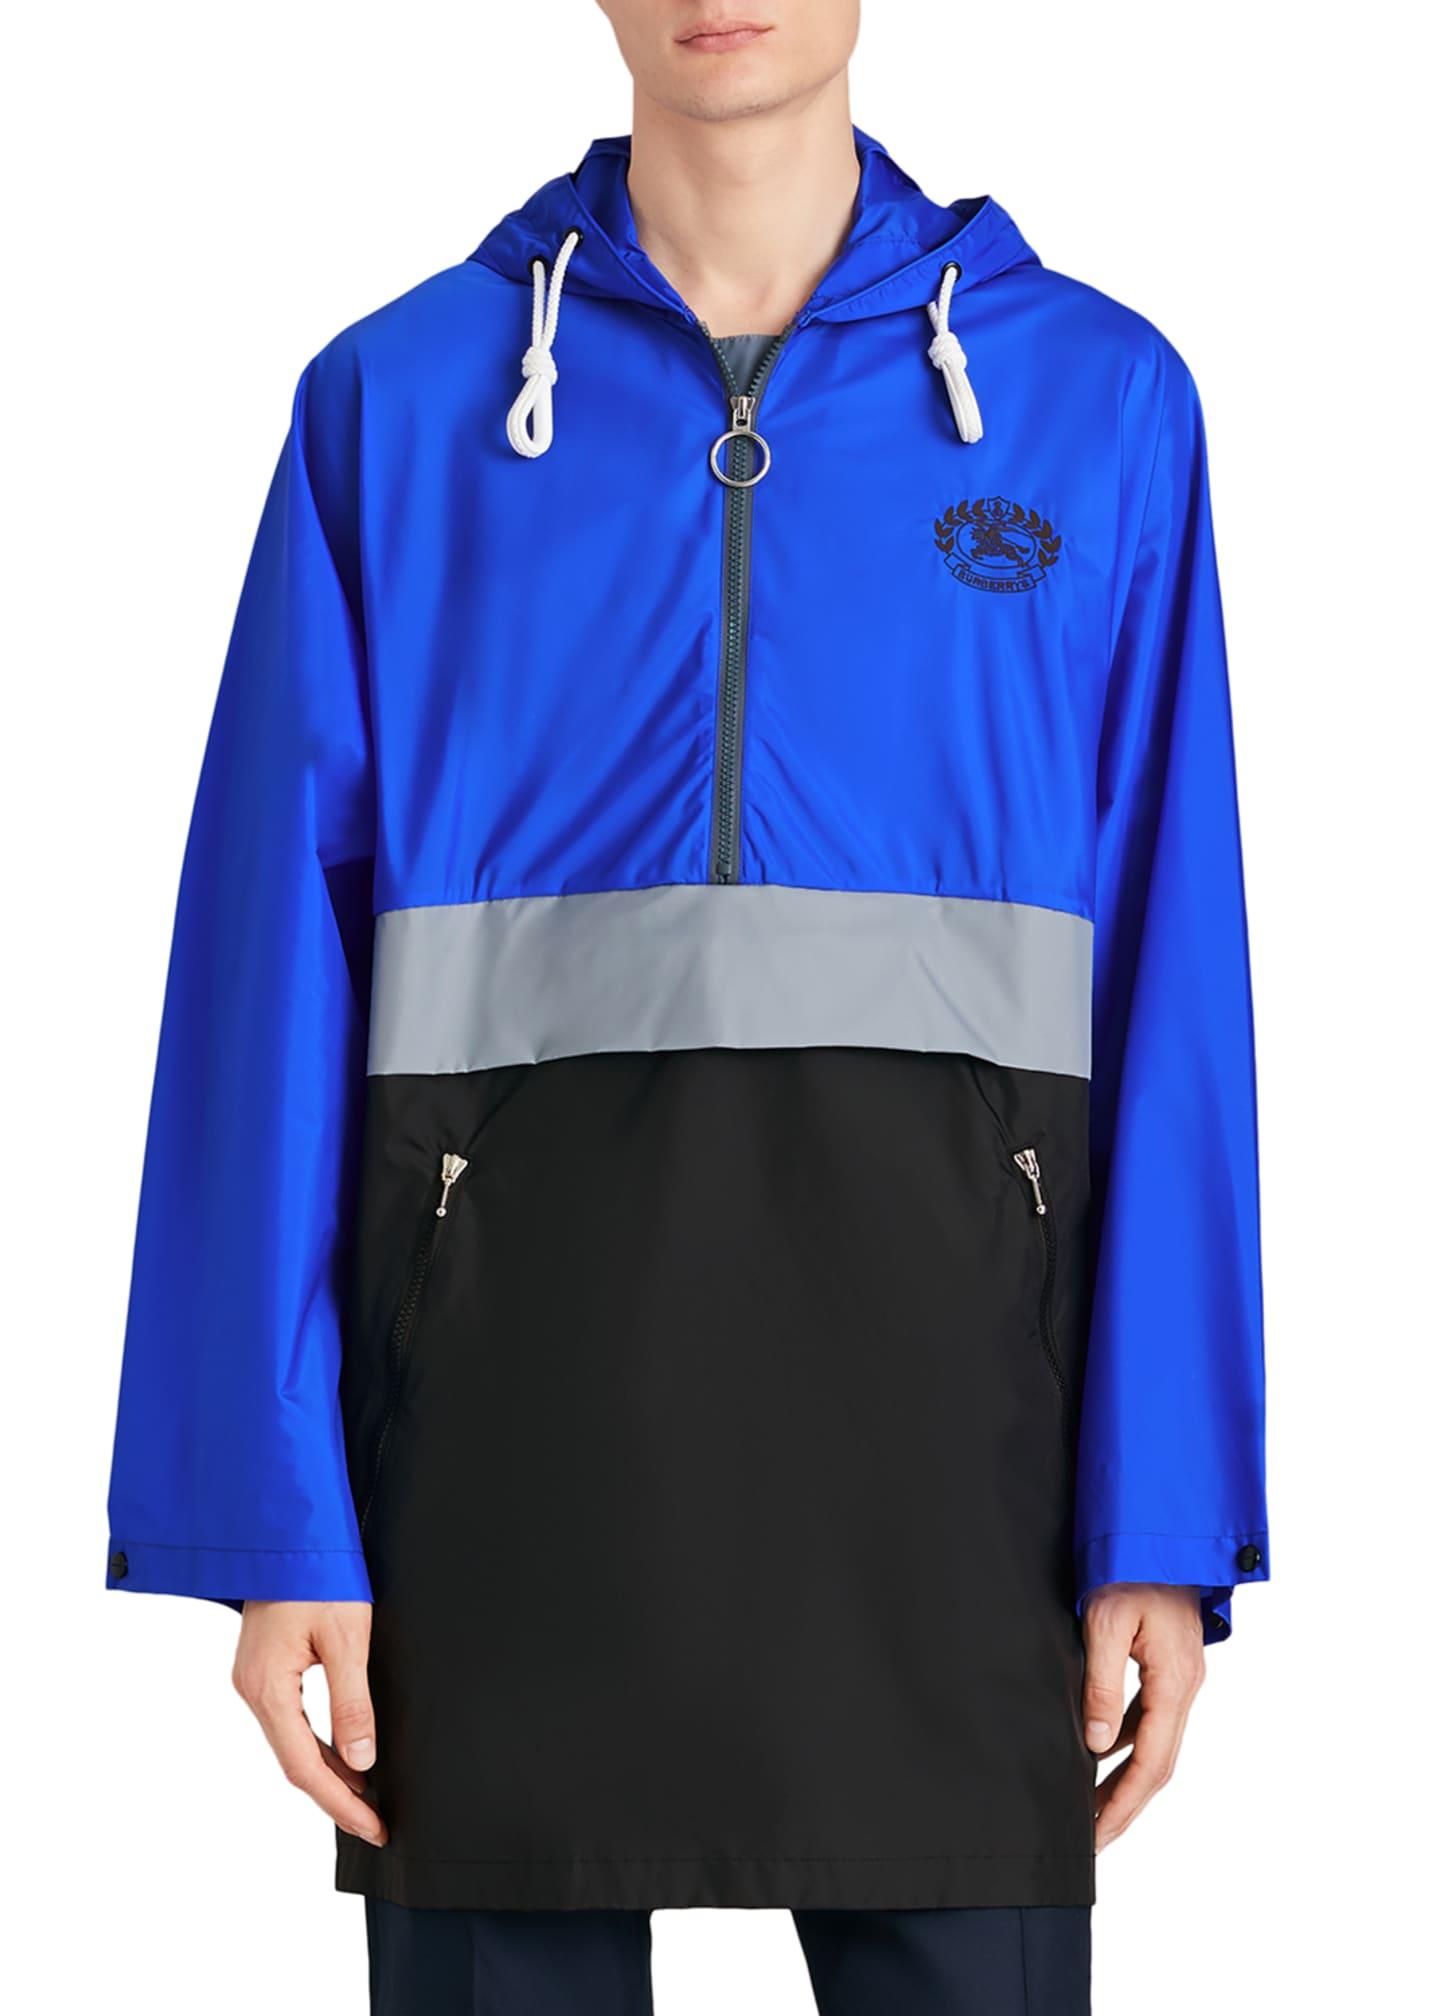 Burberry Men's Lakebridge Colorblock Parka Jacket